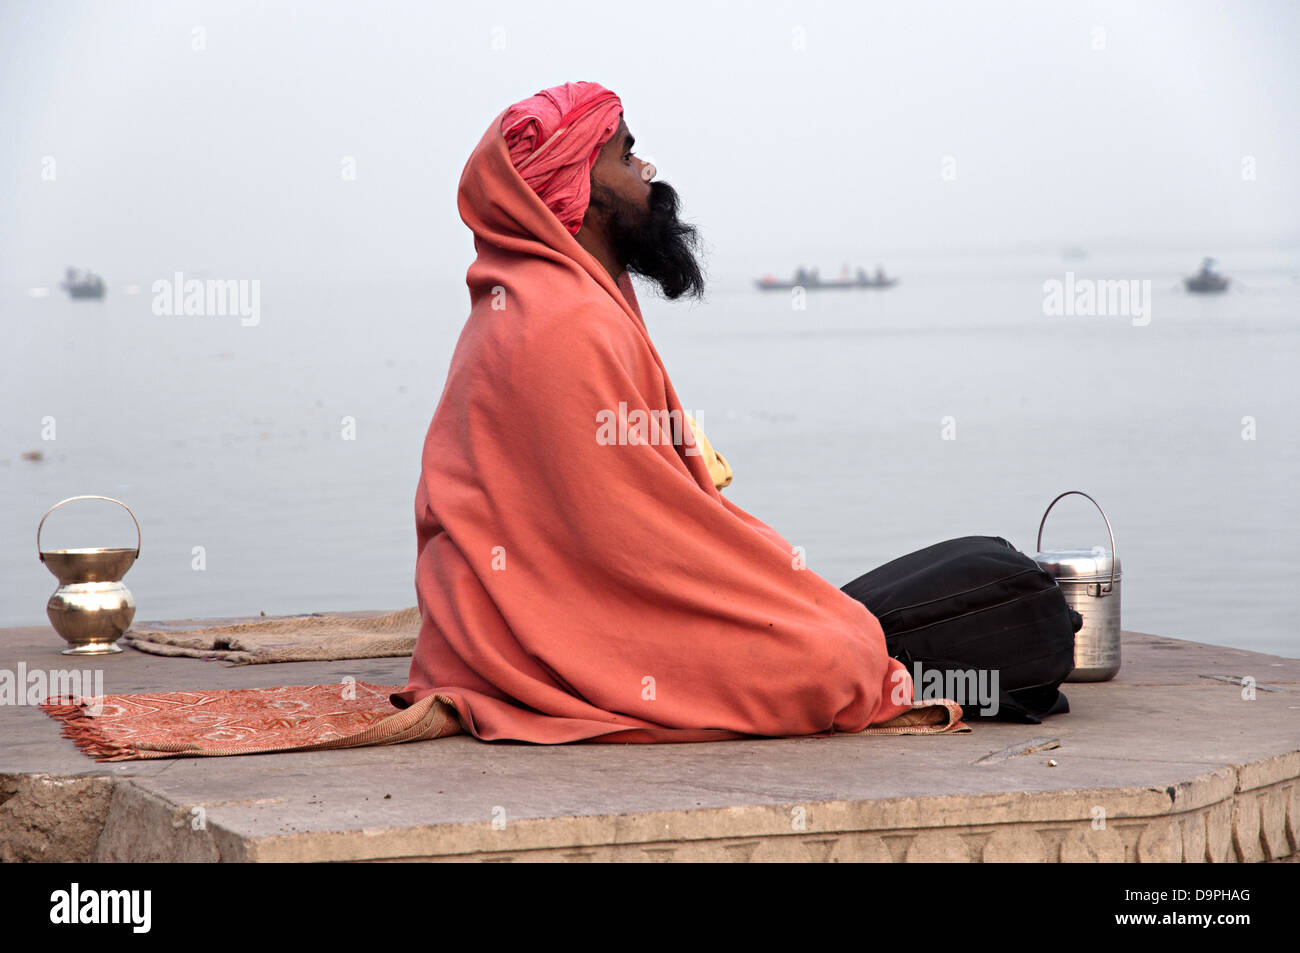 Sadhu on the ghats. Varanasi, Benares, Uttar Pradesh, India - Stock Image